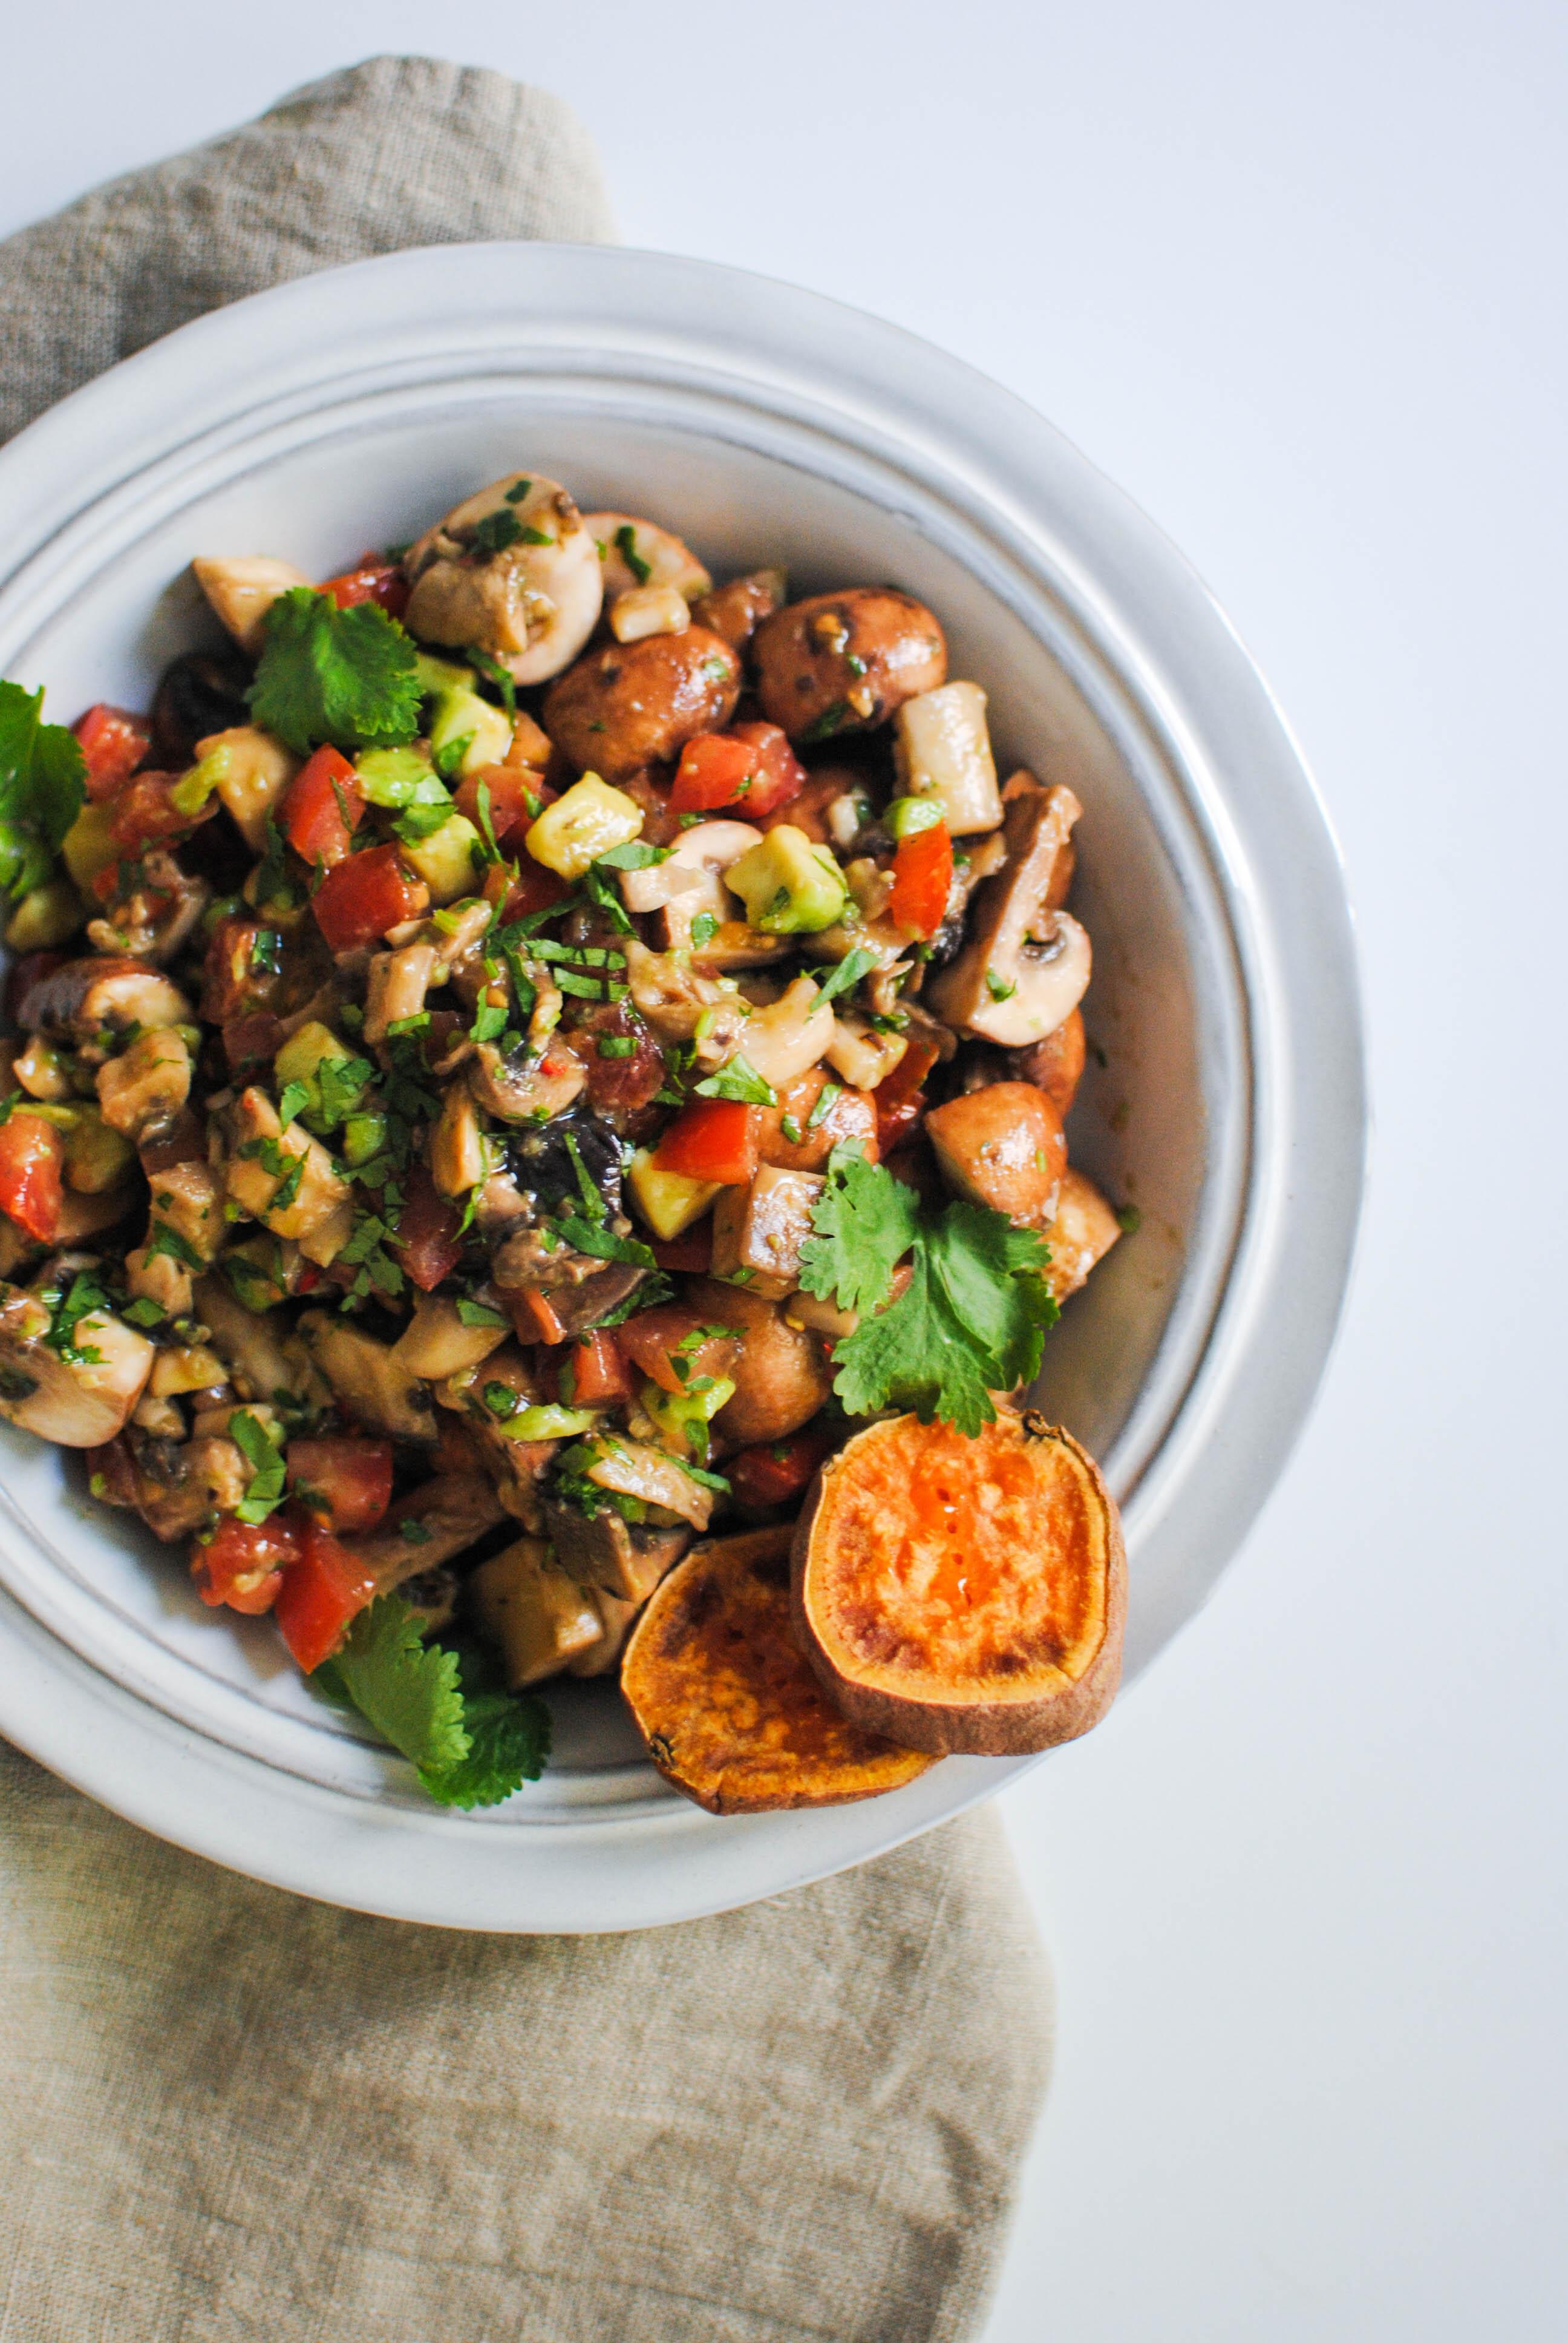 mushroom ceviche | please consider | joana limao